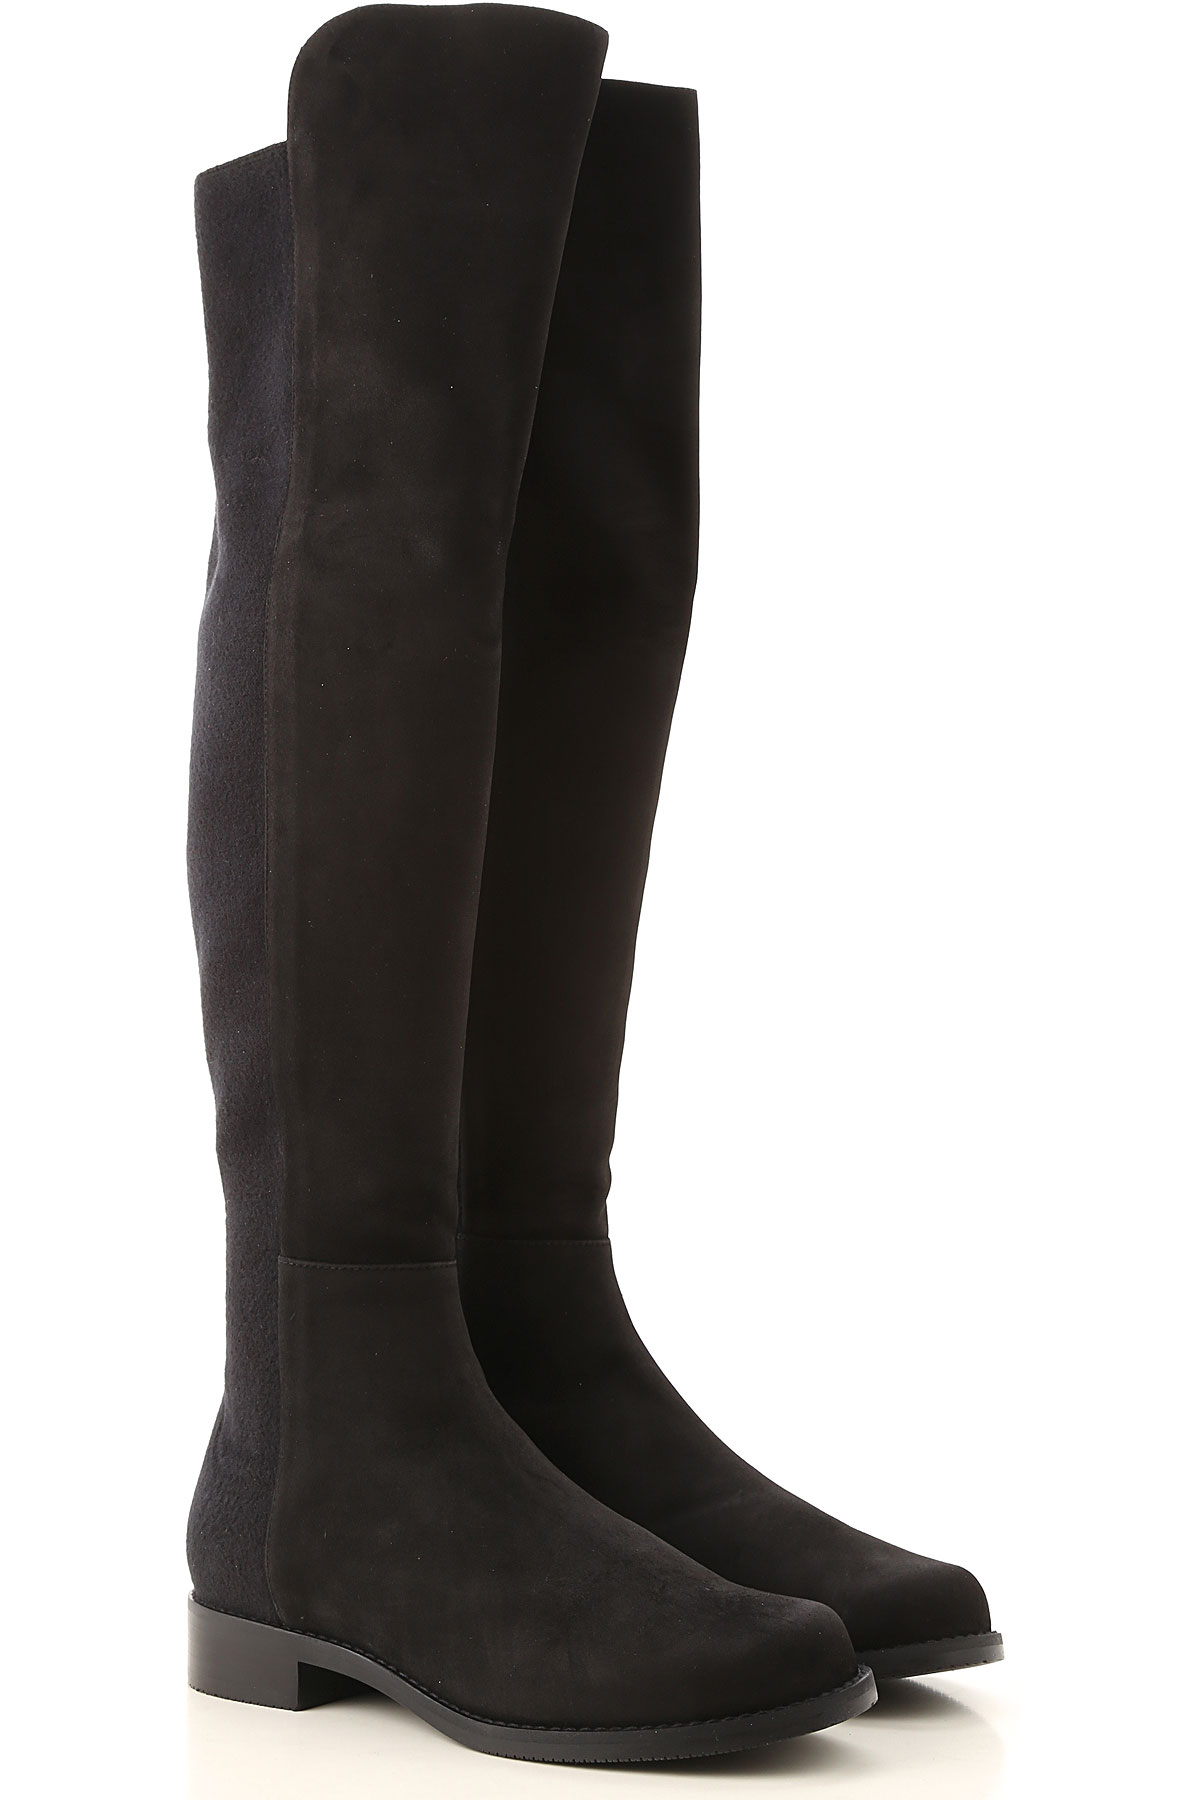 Stuart Weitzman Boots for Women, Booties On Sale, Black, Suede leather, 2019, US 5 (EU 35.5) US 5.5 (EU 36) US 6 (EU 36.5) US 7 (EU 37.5) US 6.5 (EU 3